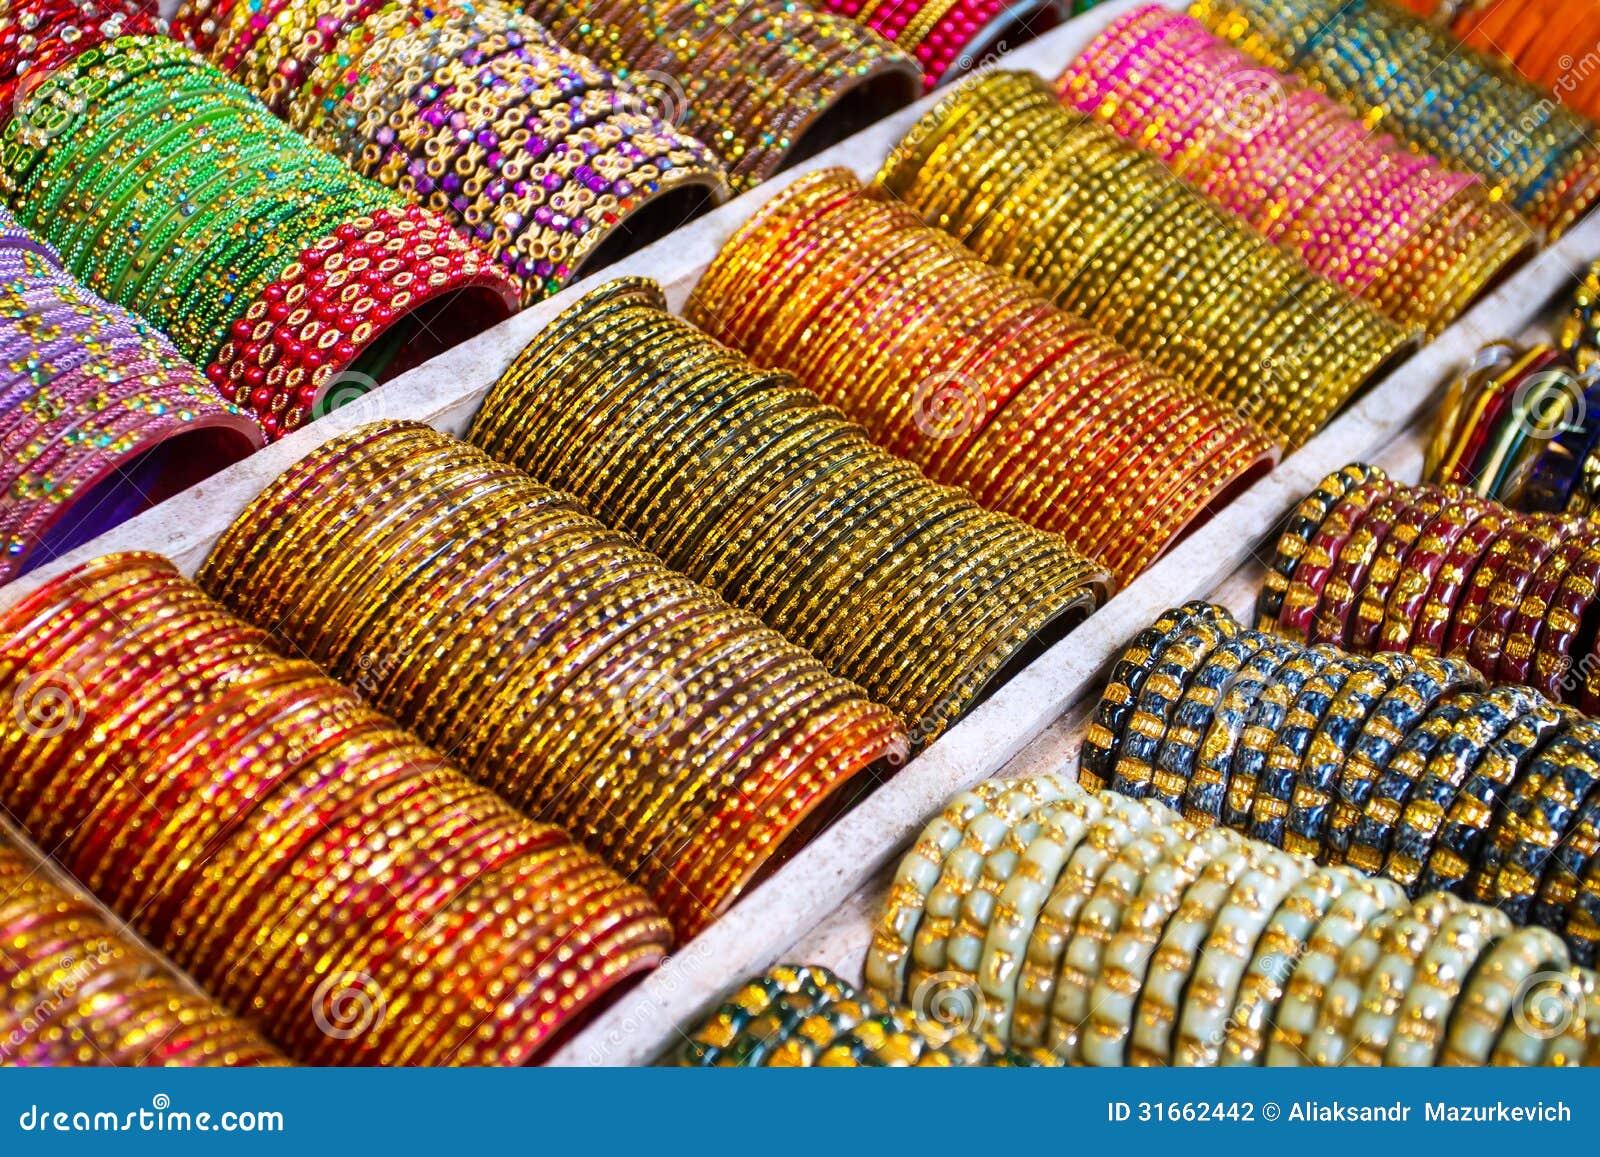 Colorful bangles jewelery bracelets stock photography image